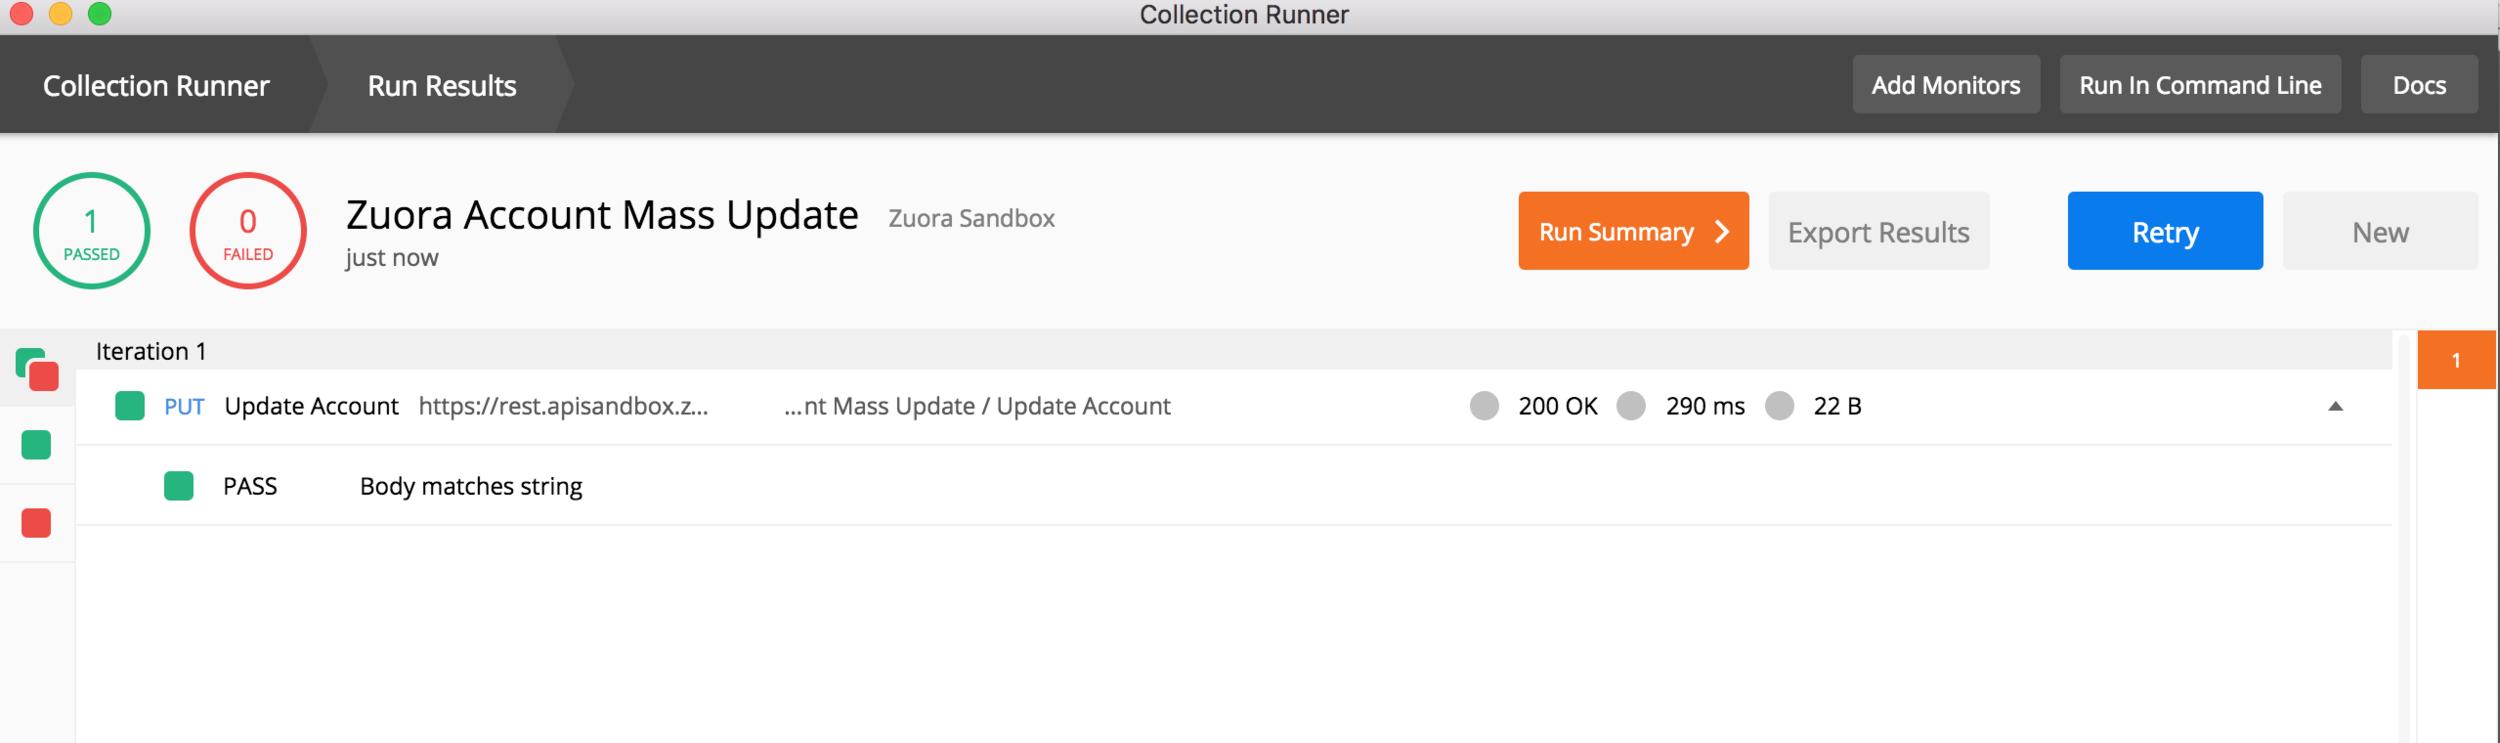 Zuora Postman Runner Request Results